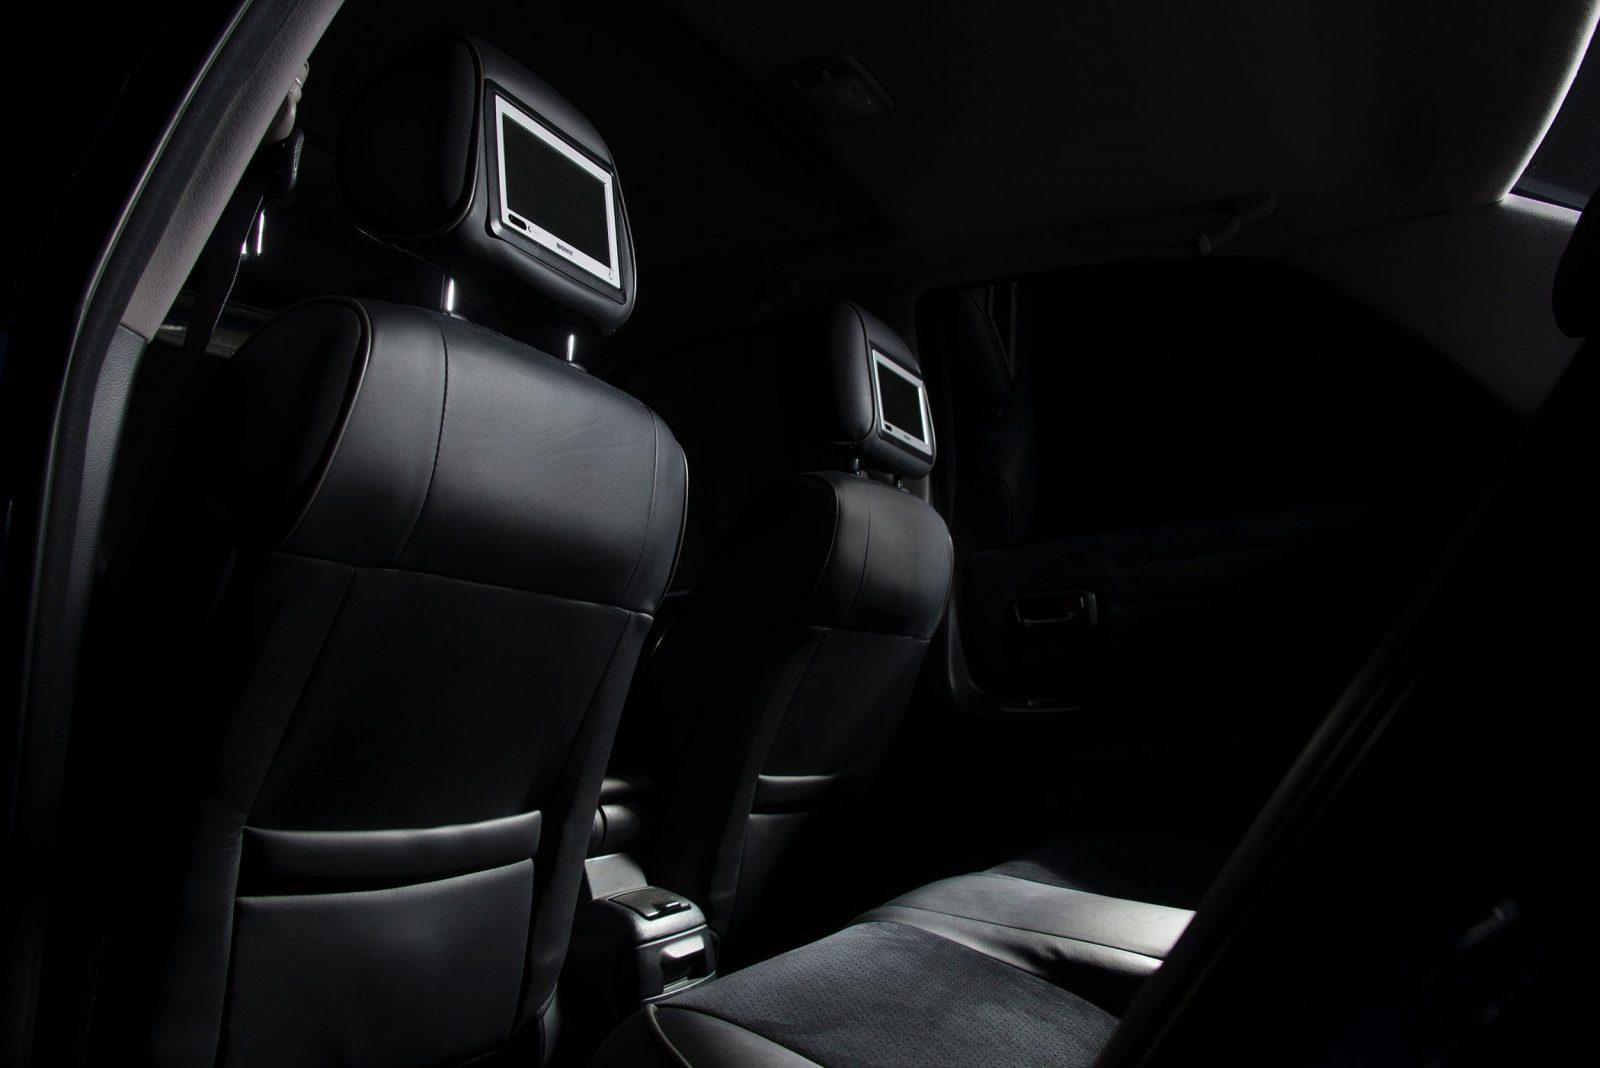 2013SEMA_2004_Lexus_IS_300_Cortez_006